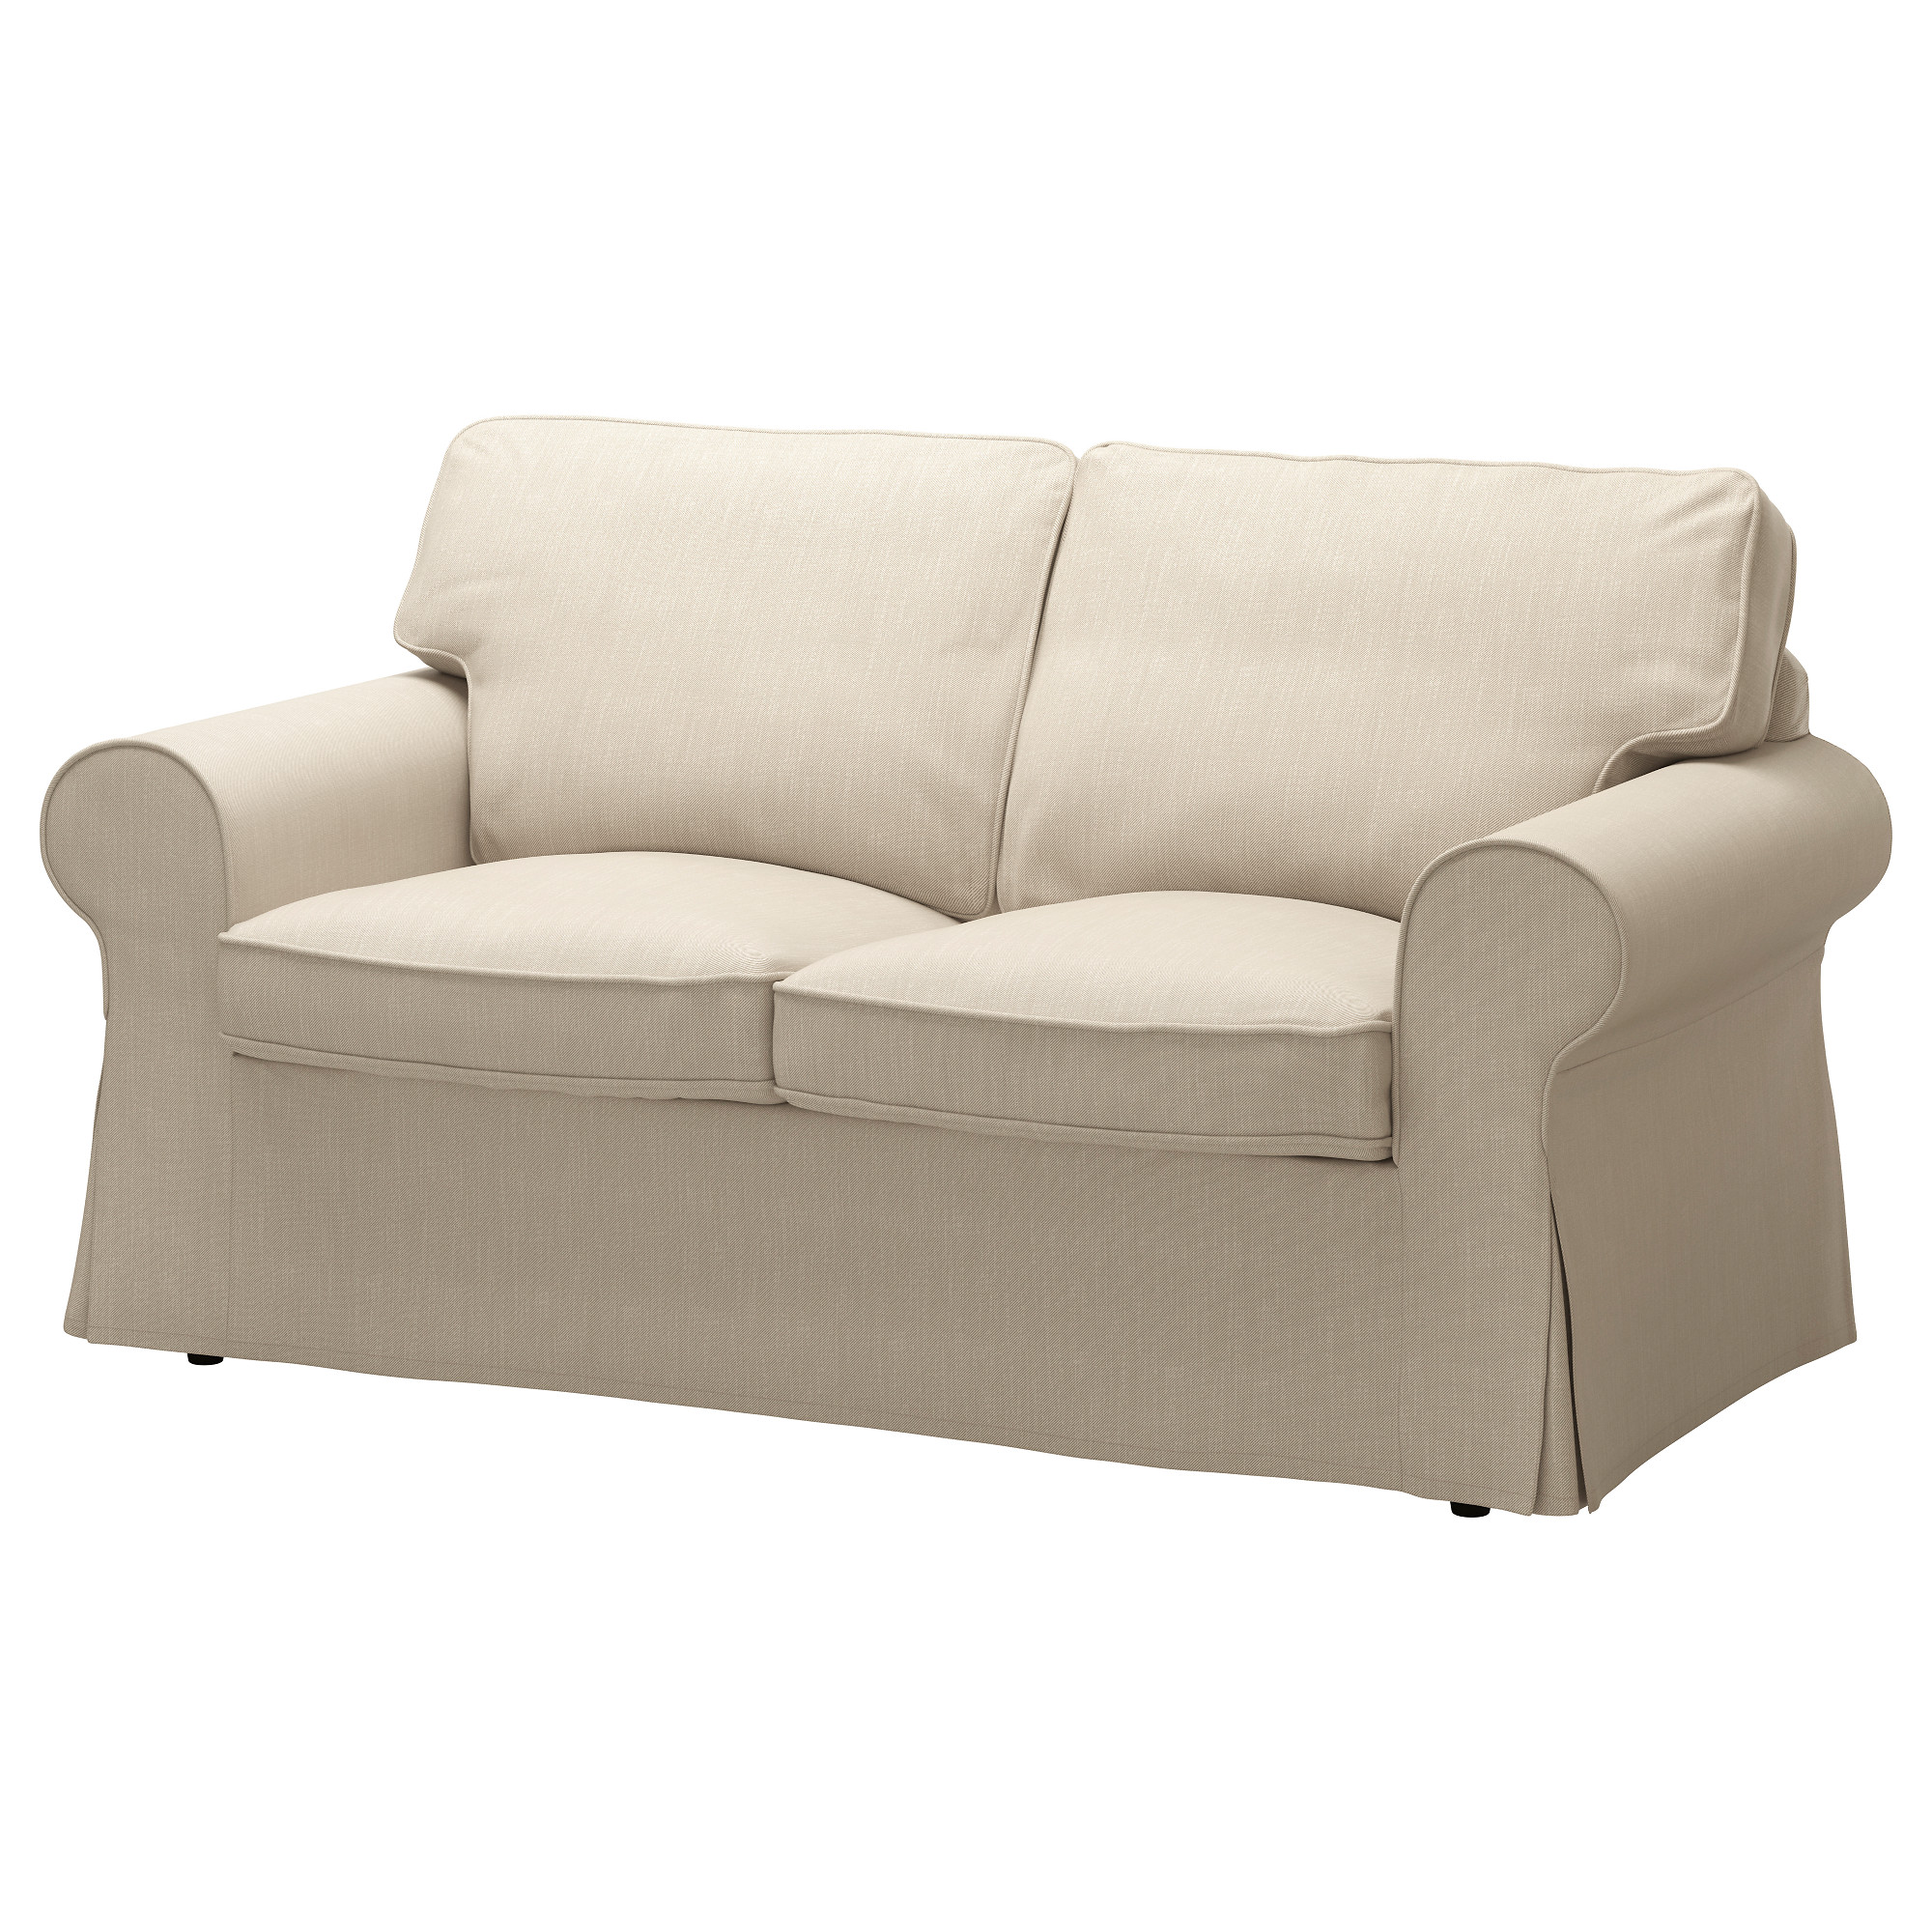 ikea ektorp sofa cover EKTORP Loveseat cover, Nordvalla dark beige | Dark beige, Loveseat  ikea ektorp sofa cover